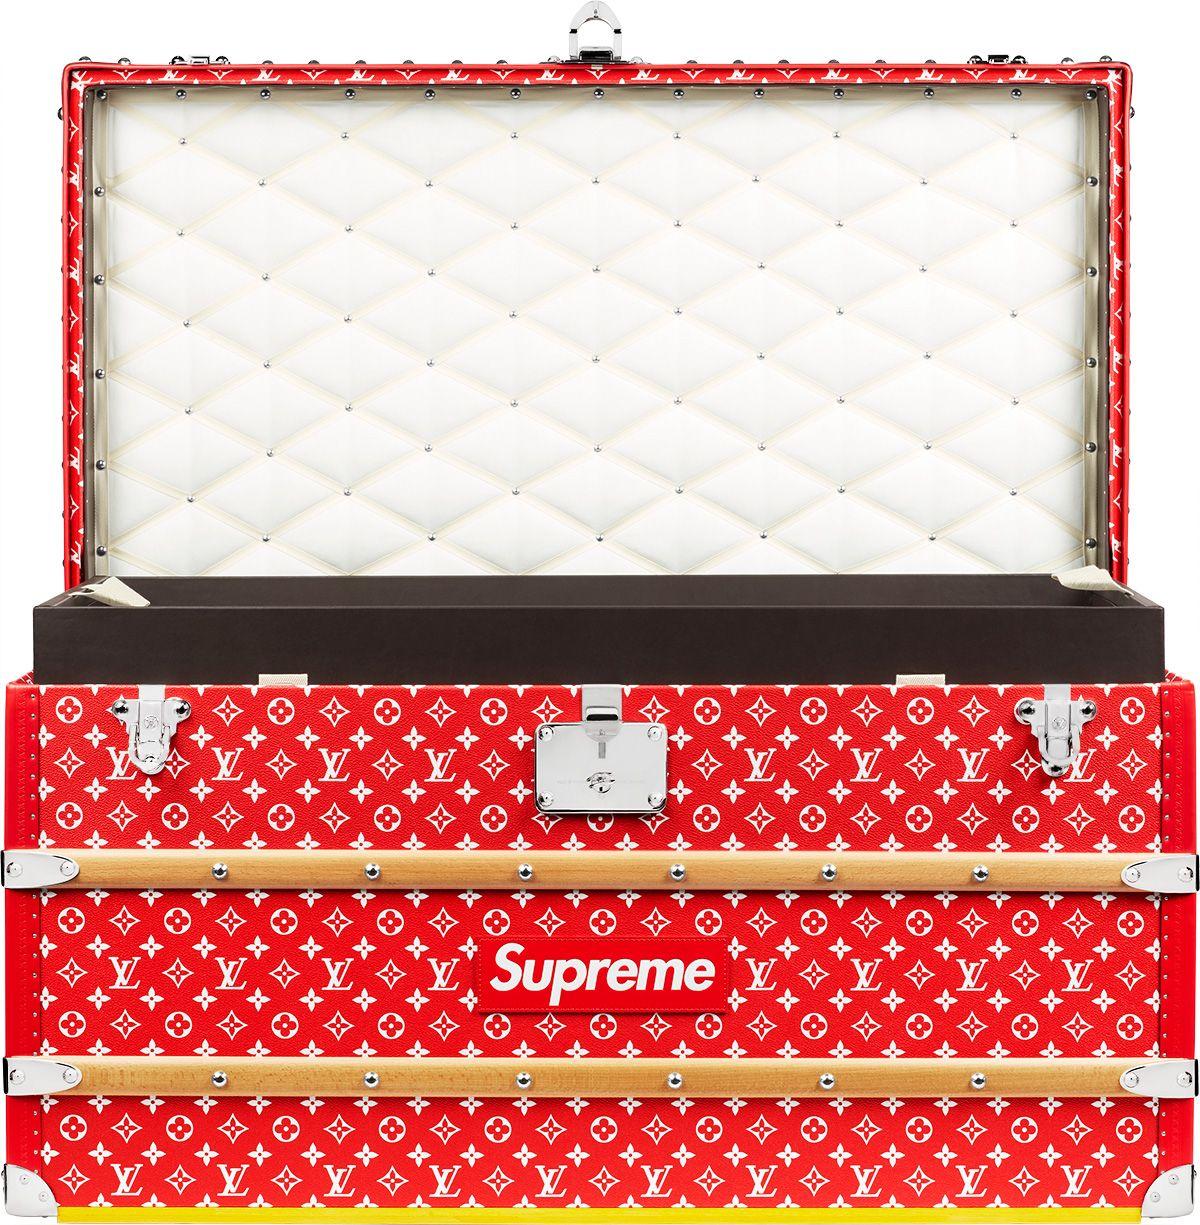 53e11a3870e7 Supreme Louis Vuitton Supreme Malle Courrier 90 Trunk